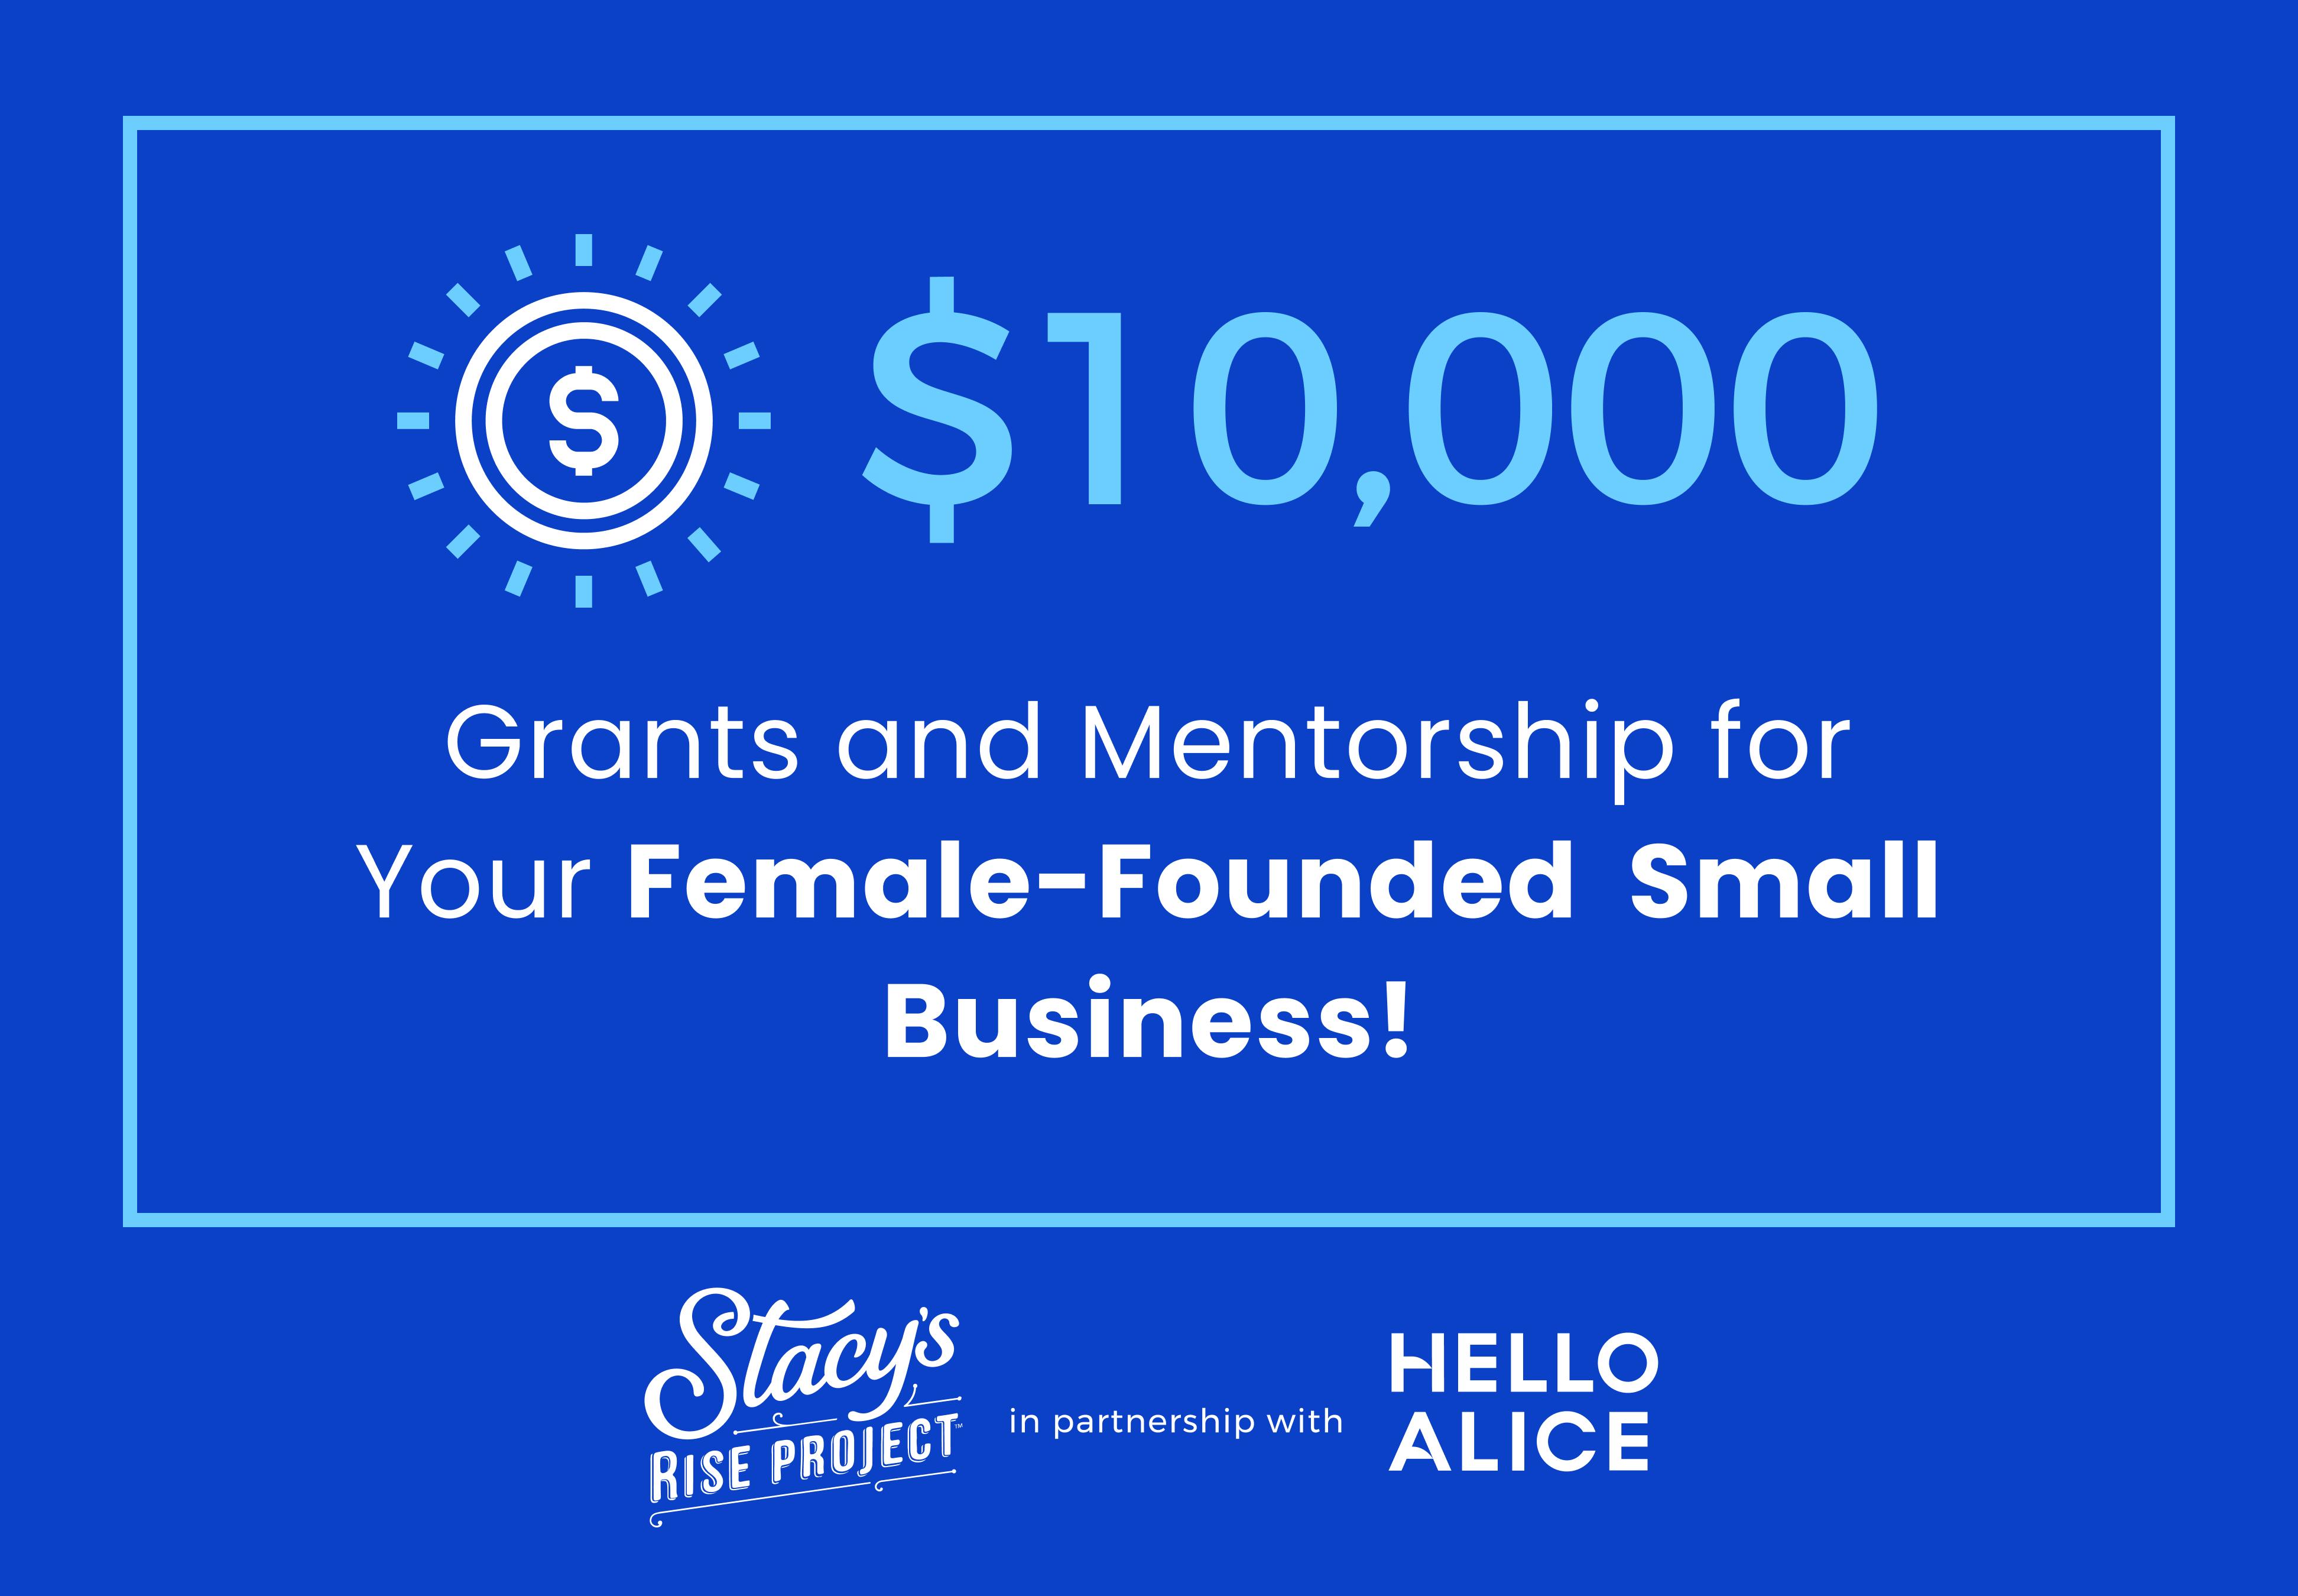 KKR small business grant